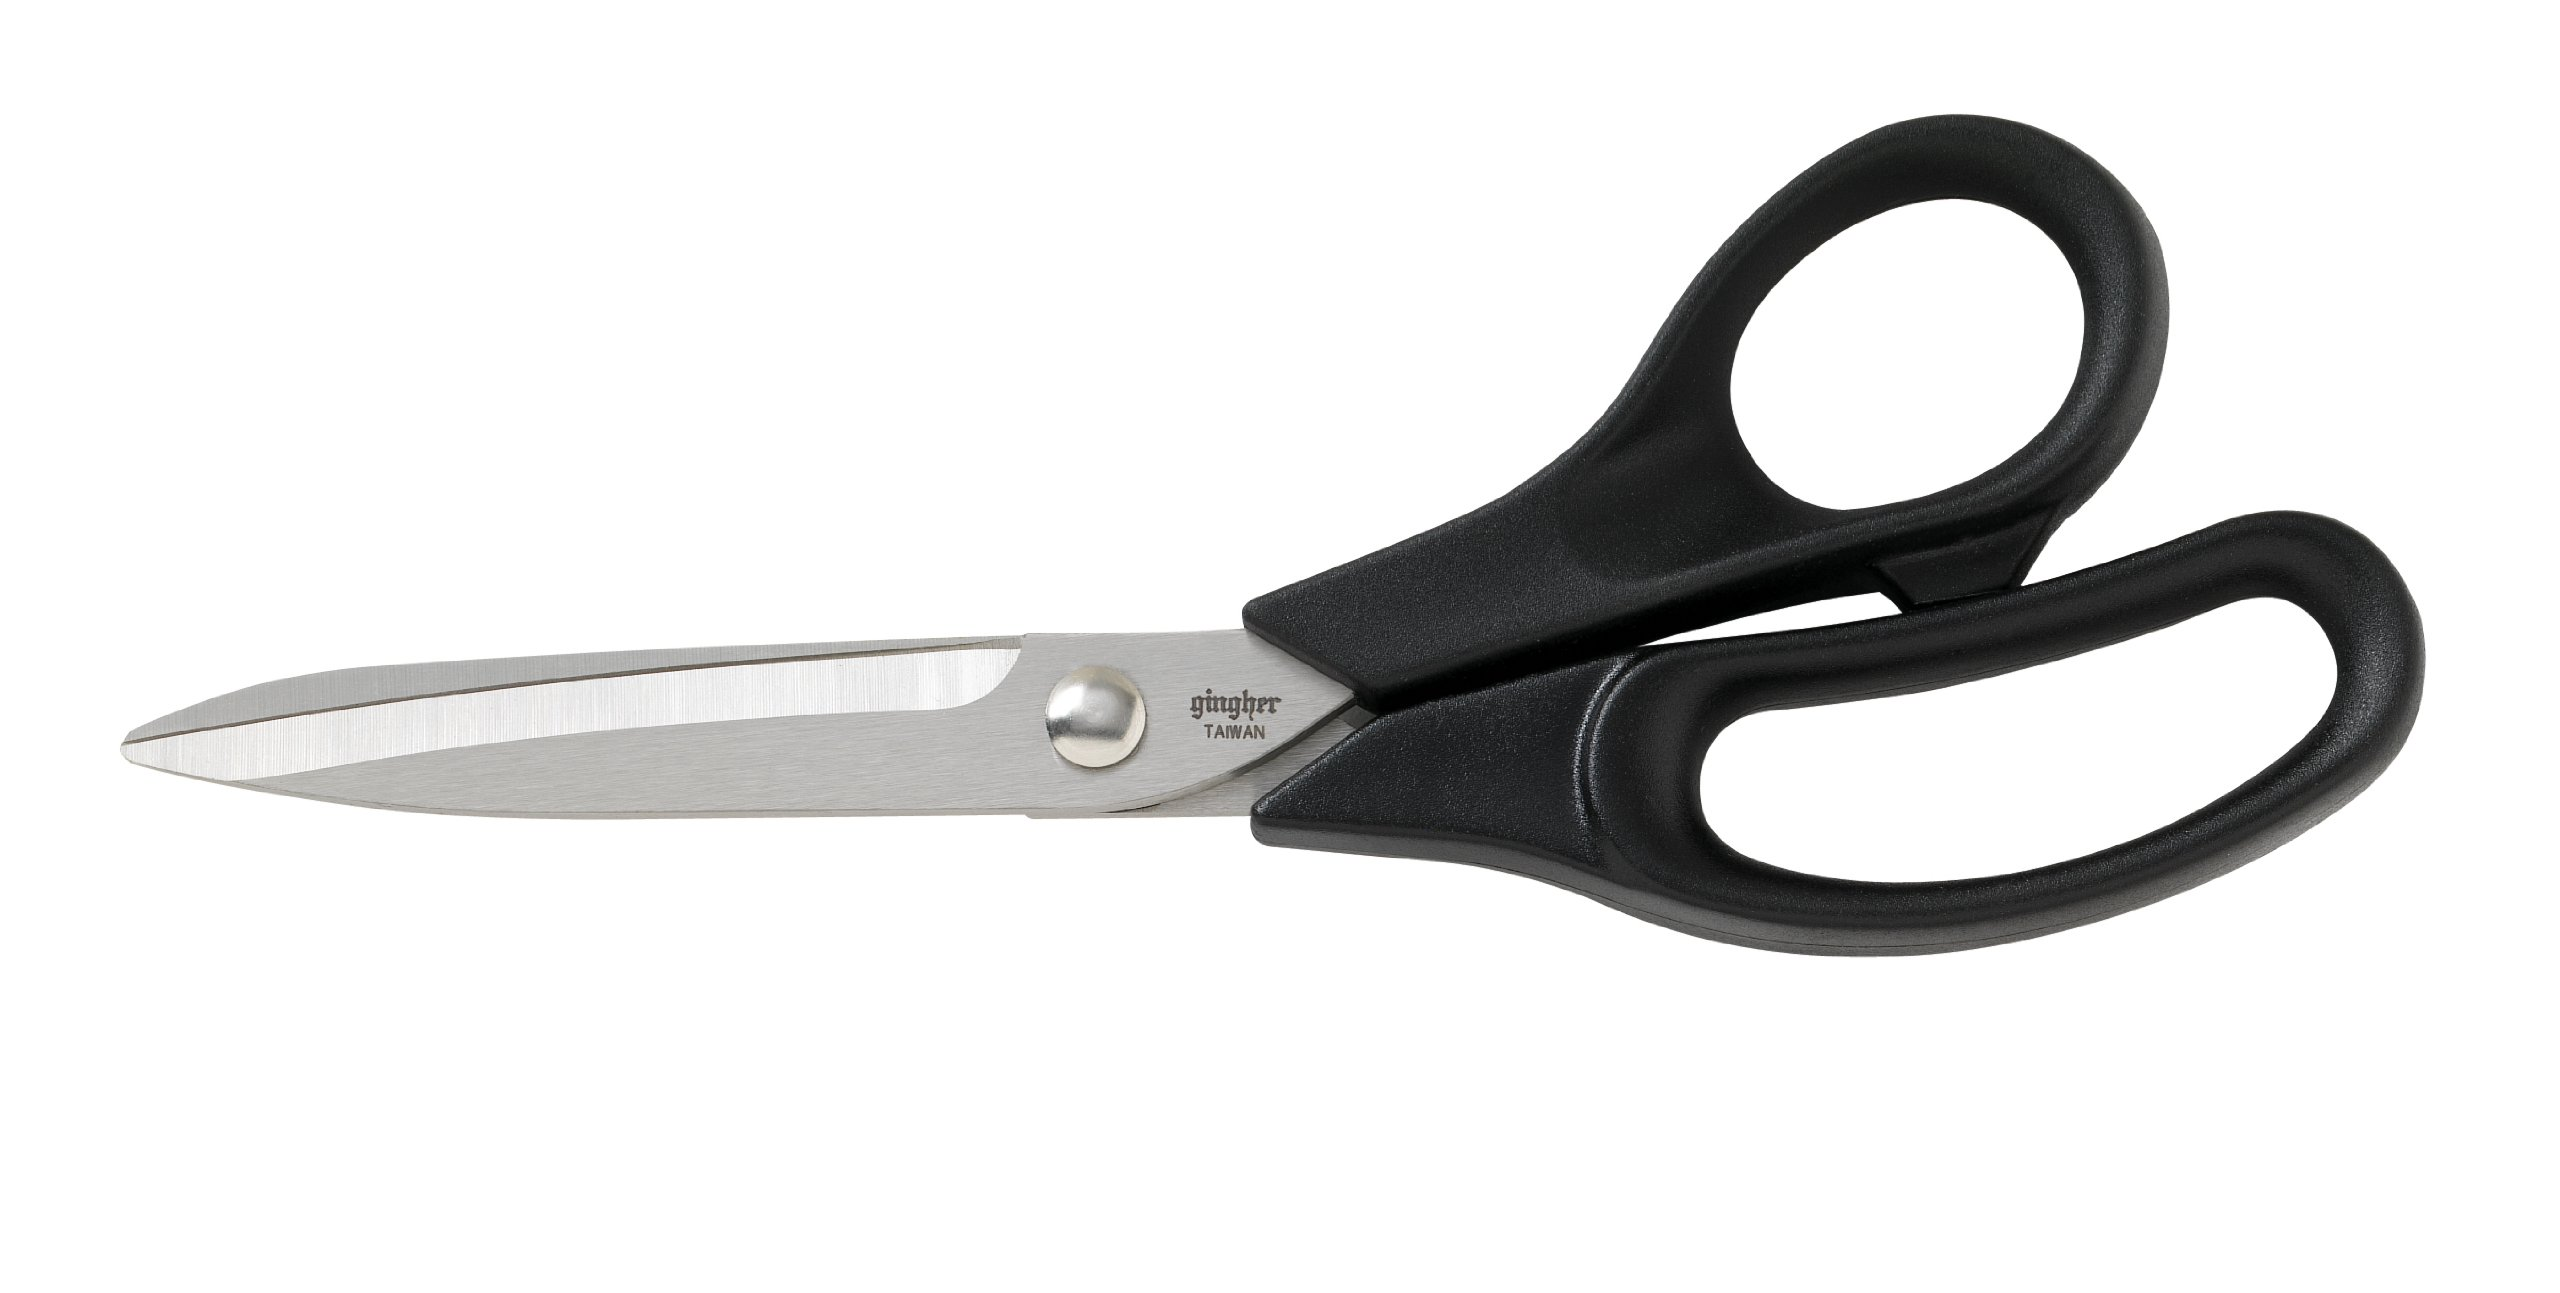 Gingher 8 Inch Lightweight Bent Trimmers (GS-8)